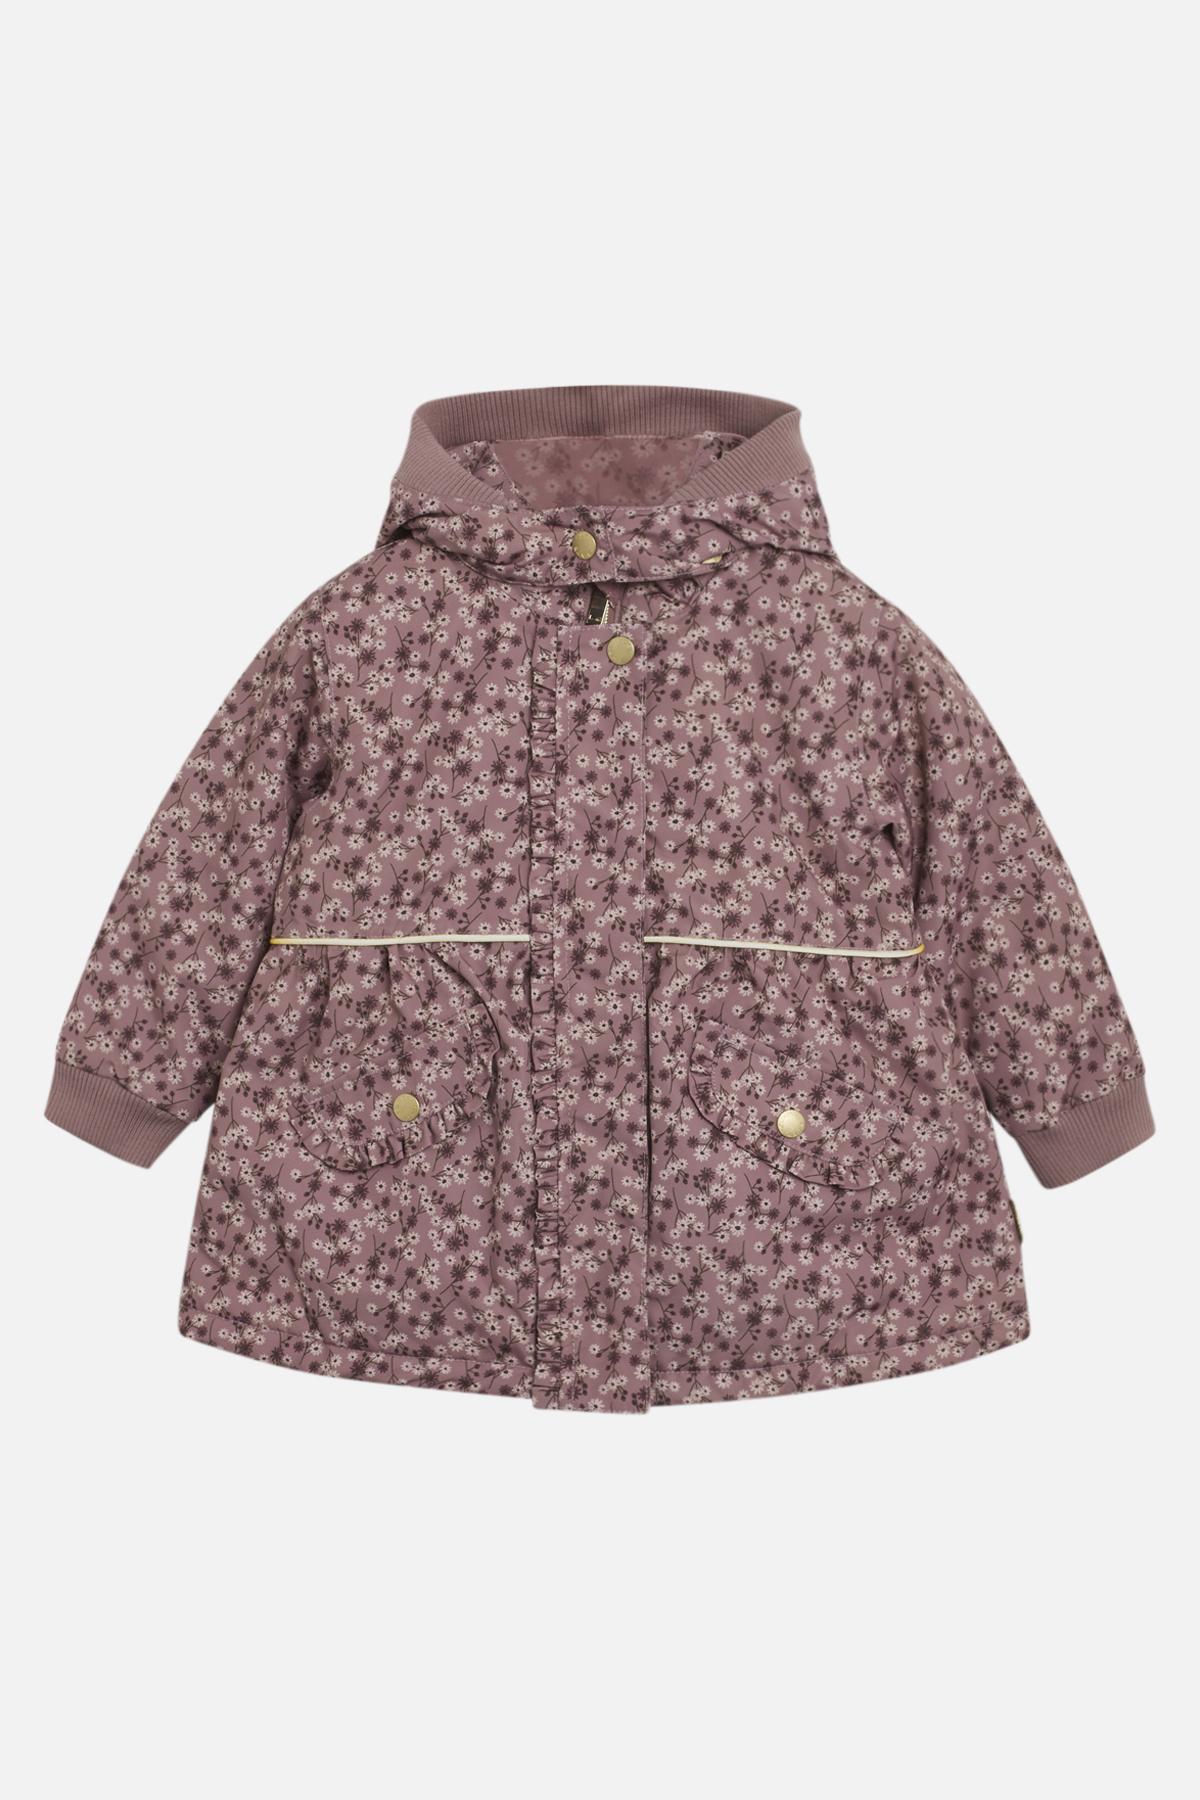 Hust & Clarie 597 12248 jakke, mauve, 92